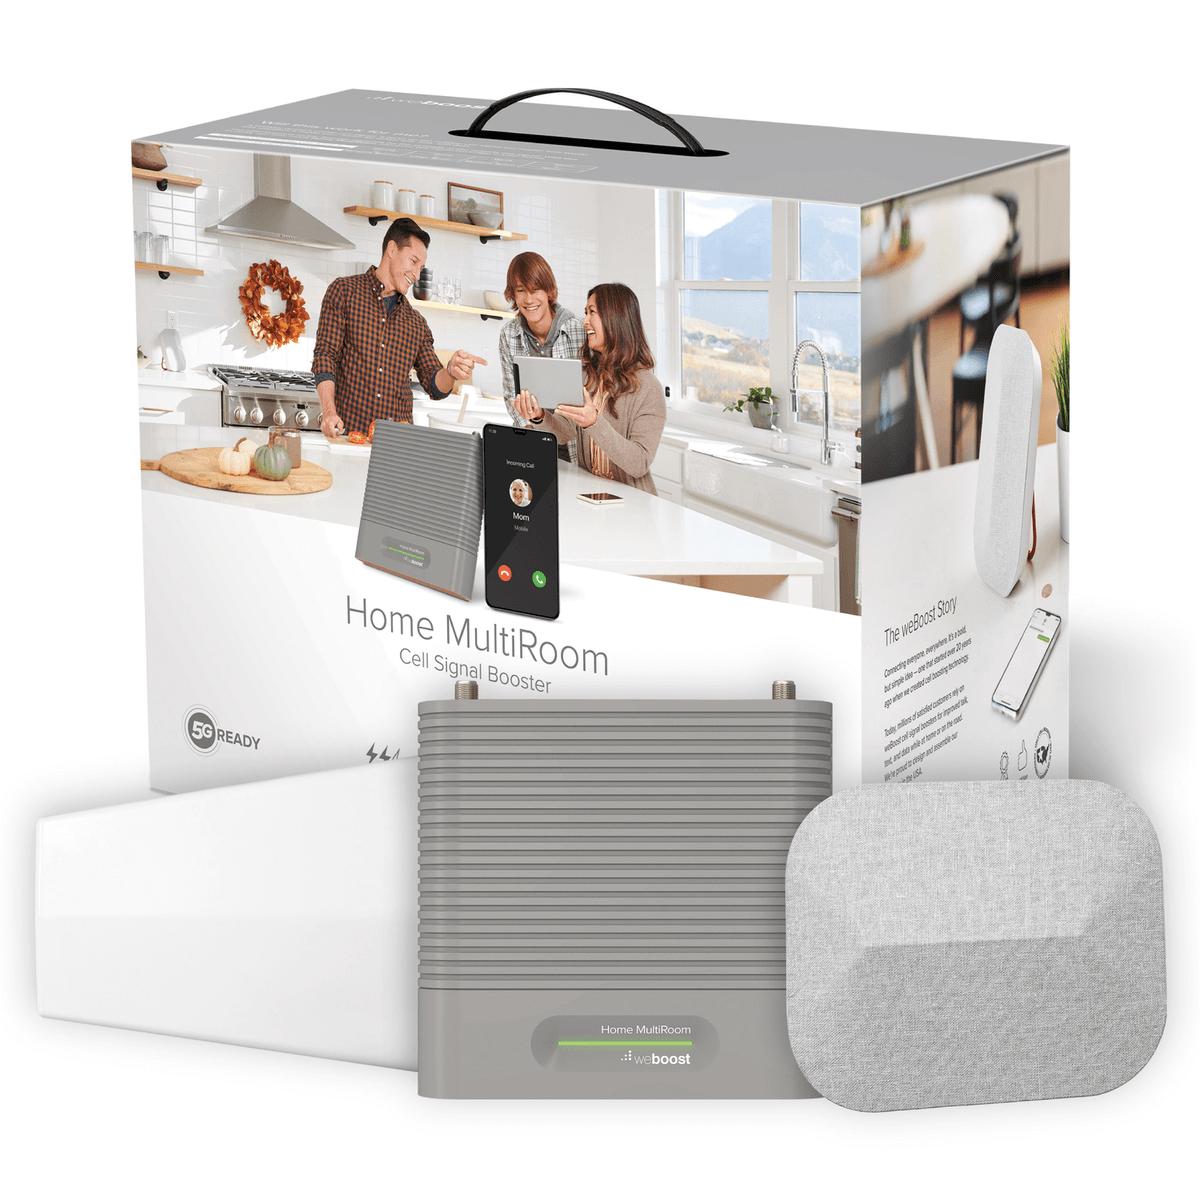 weBoost Home MultiRoom Signal Booster Kit, Refurbished - 650144R